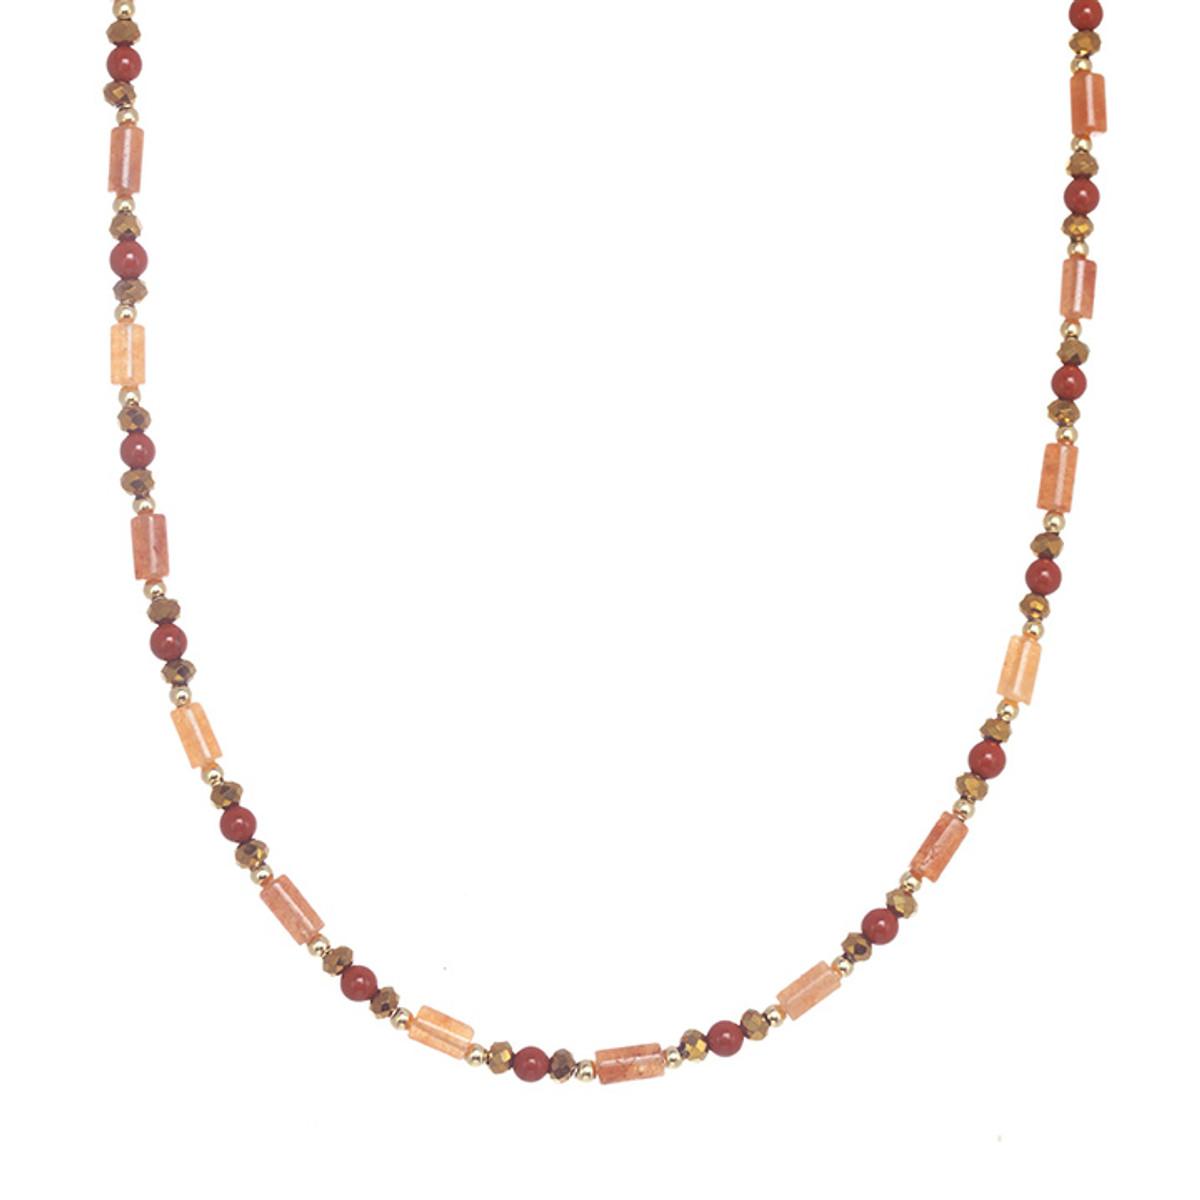 Michal Golan Cider Choker Necklace